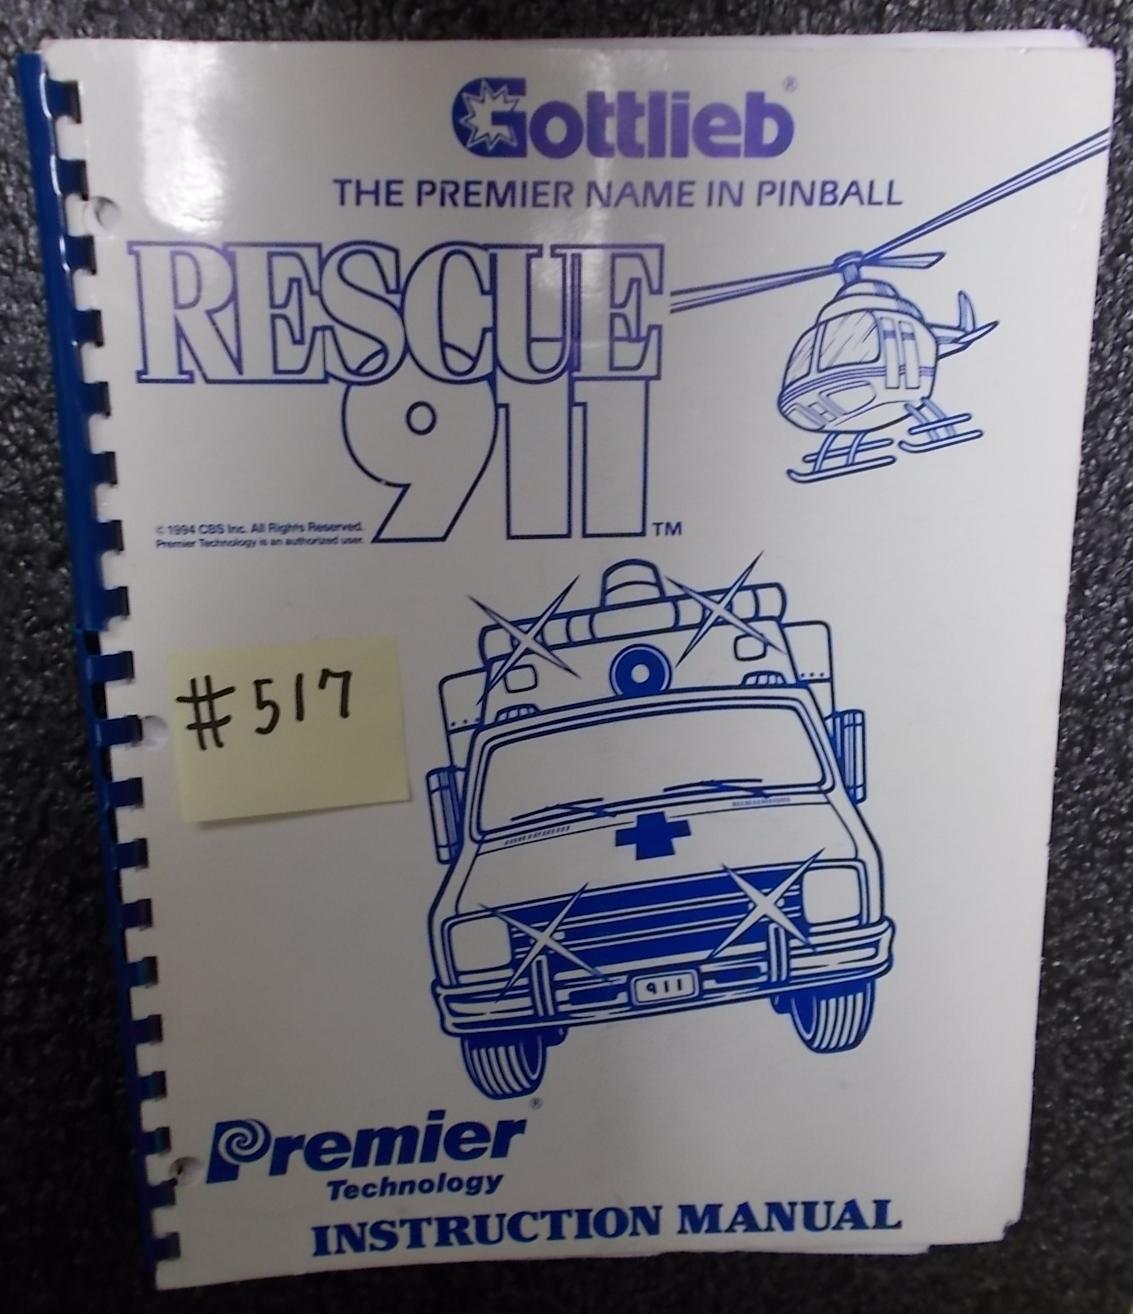 bf8d0db7cdf91b RESCUE 911 Pinball Machine Game Instruction Manual  517 for sale - GOTTLIEB